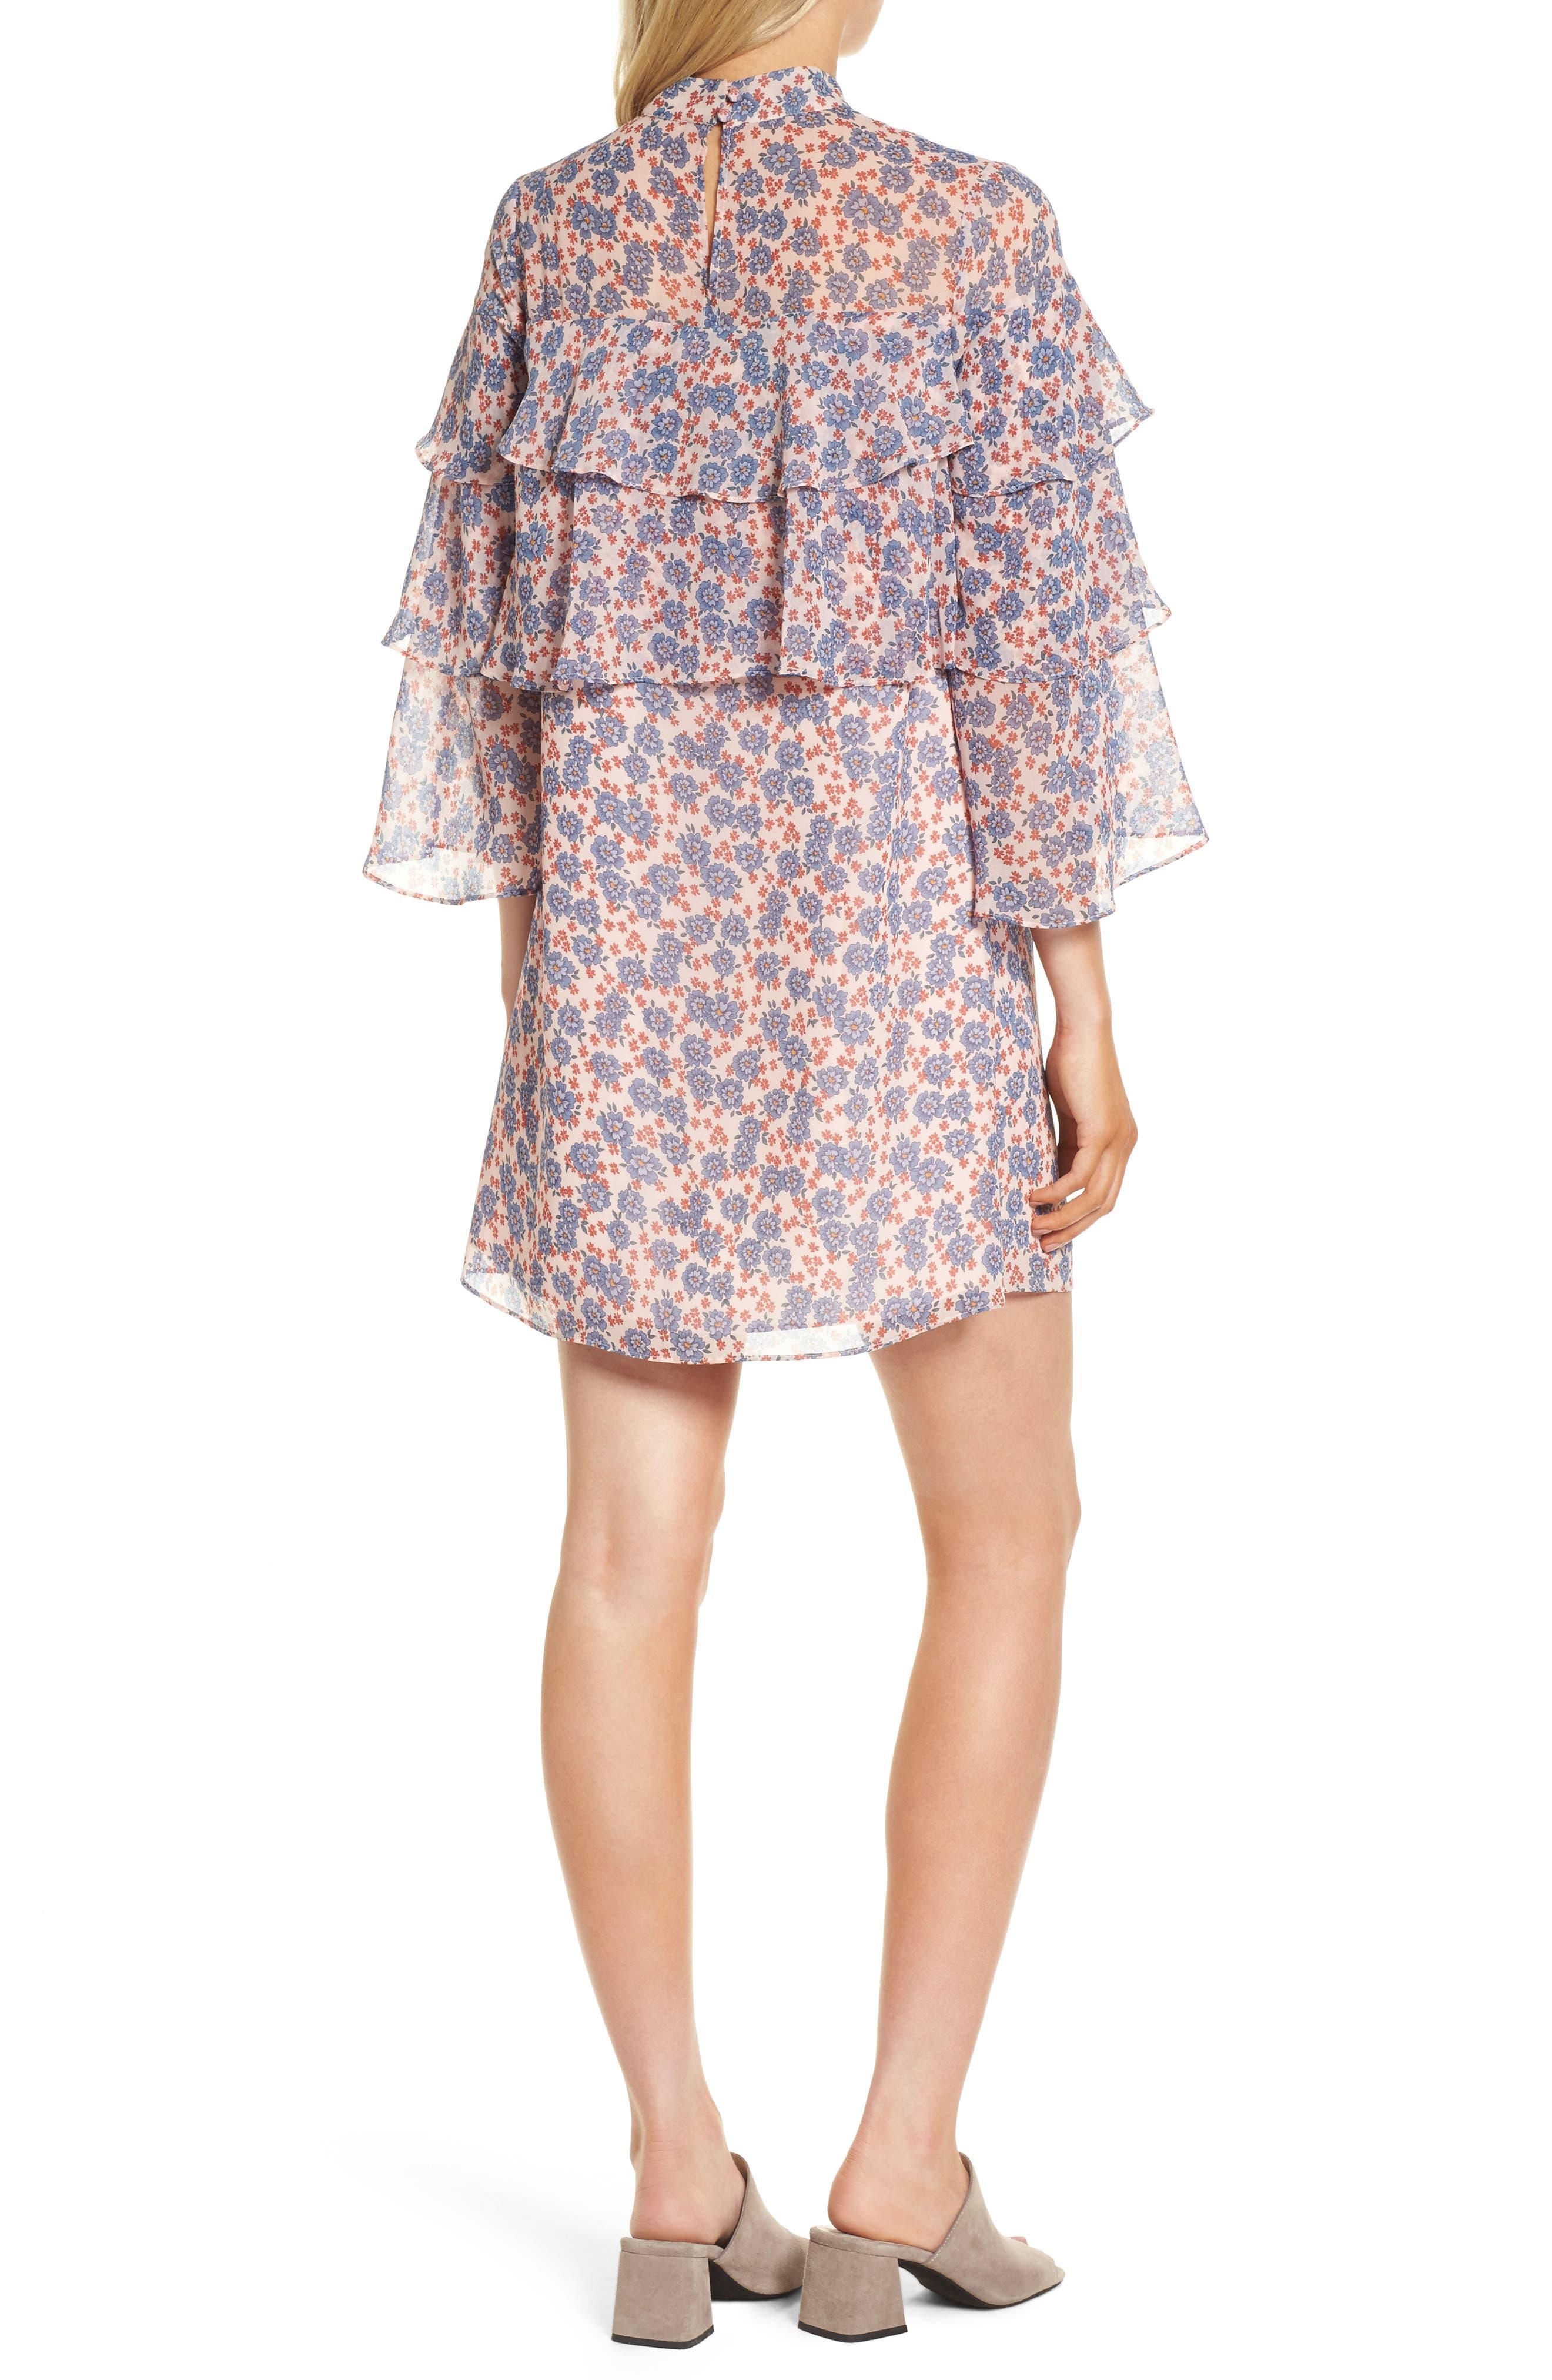 Darcy Ruffle Dress,                             Alternate thumbnail 2, color,                             Pink Multi